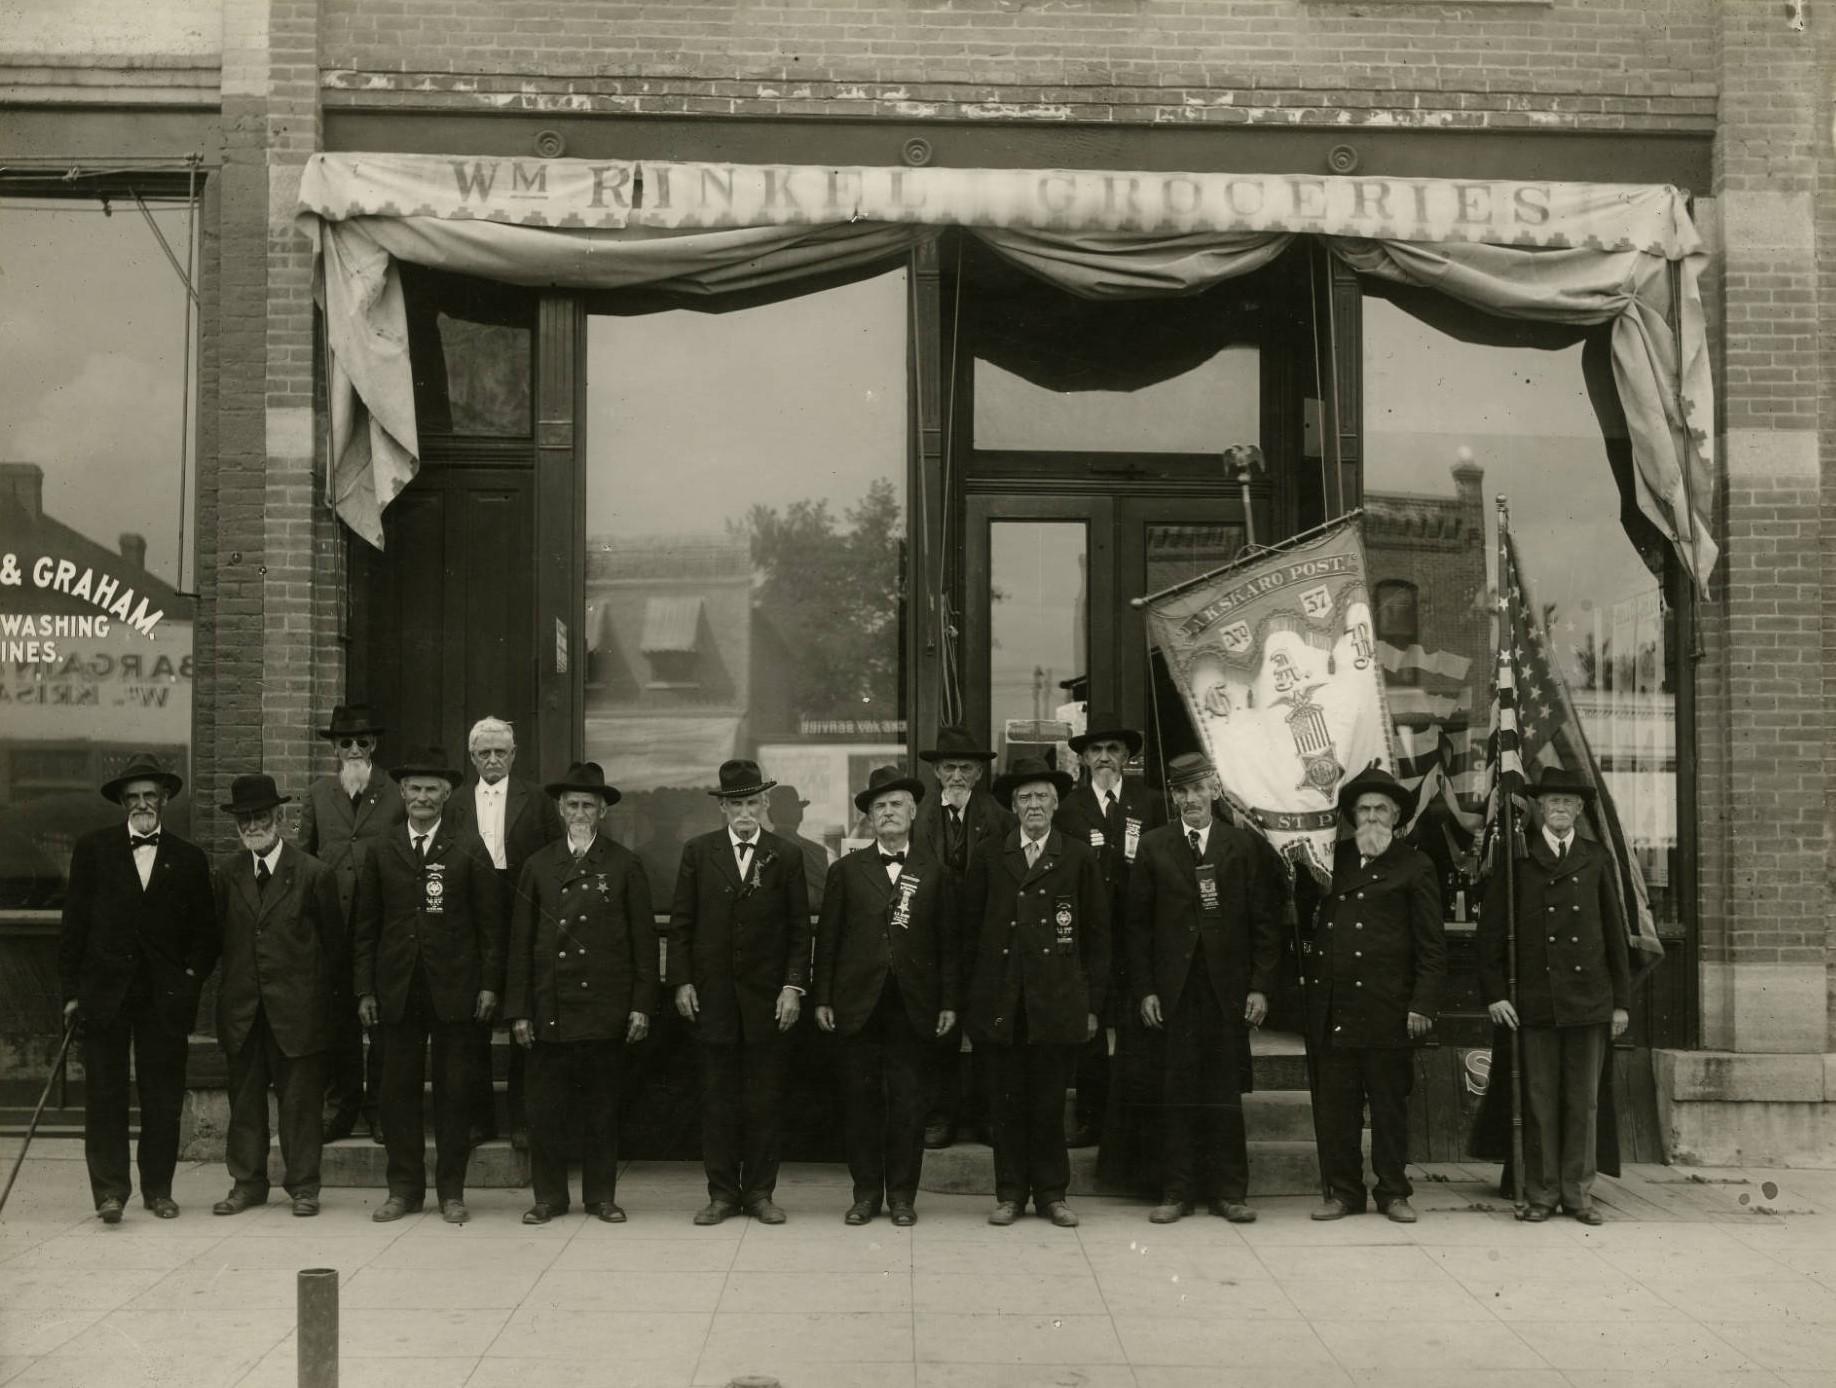 Grand Army of the Republic, ca 1920